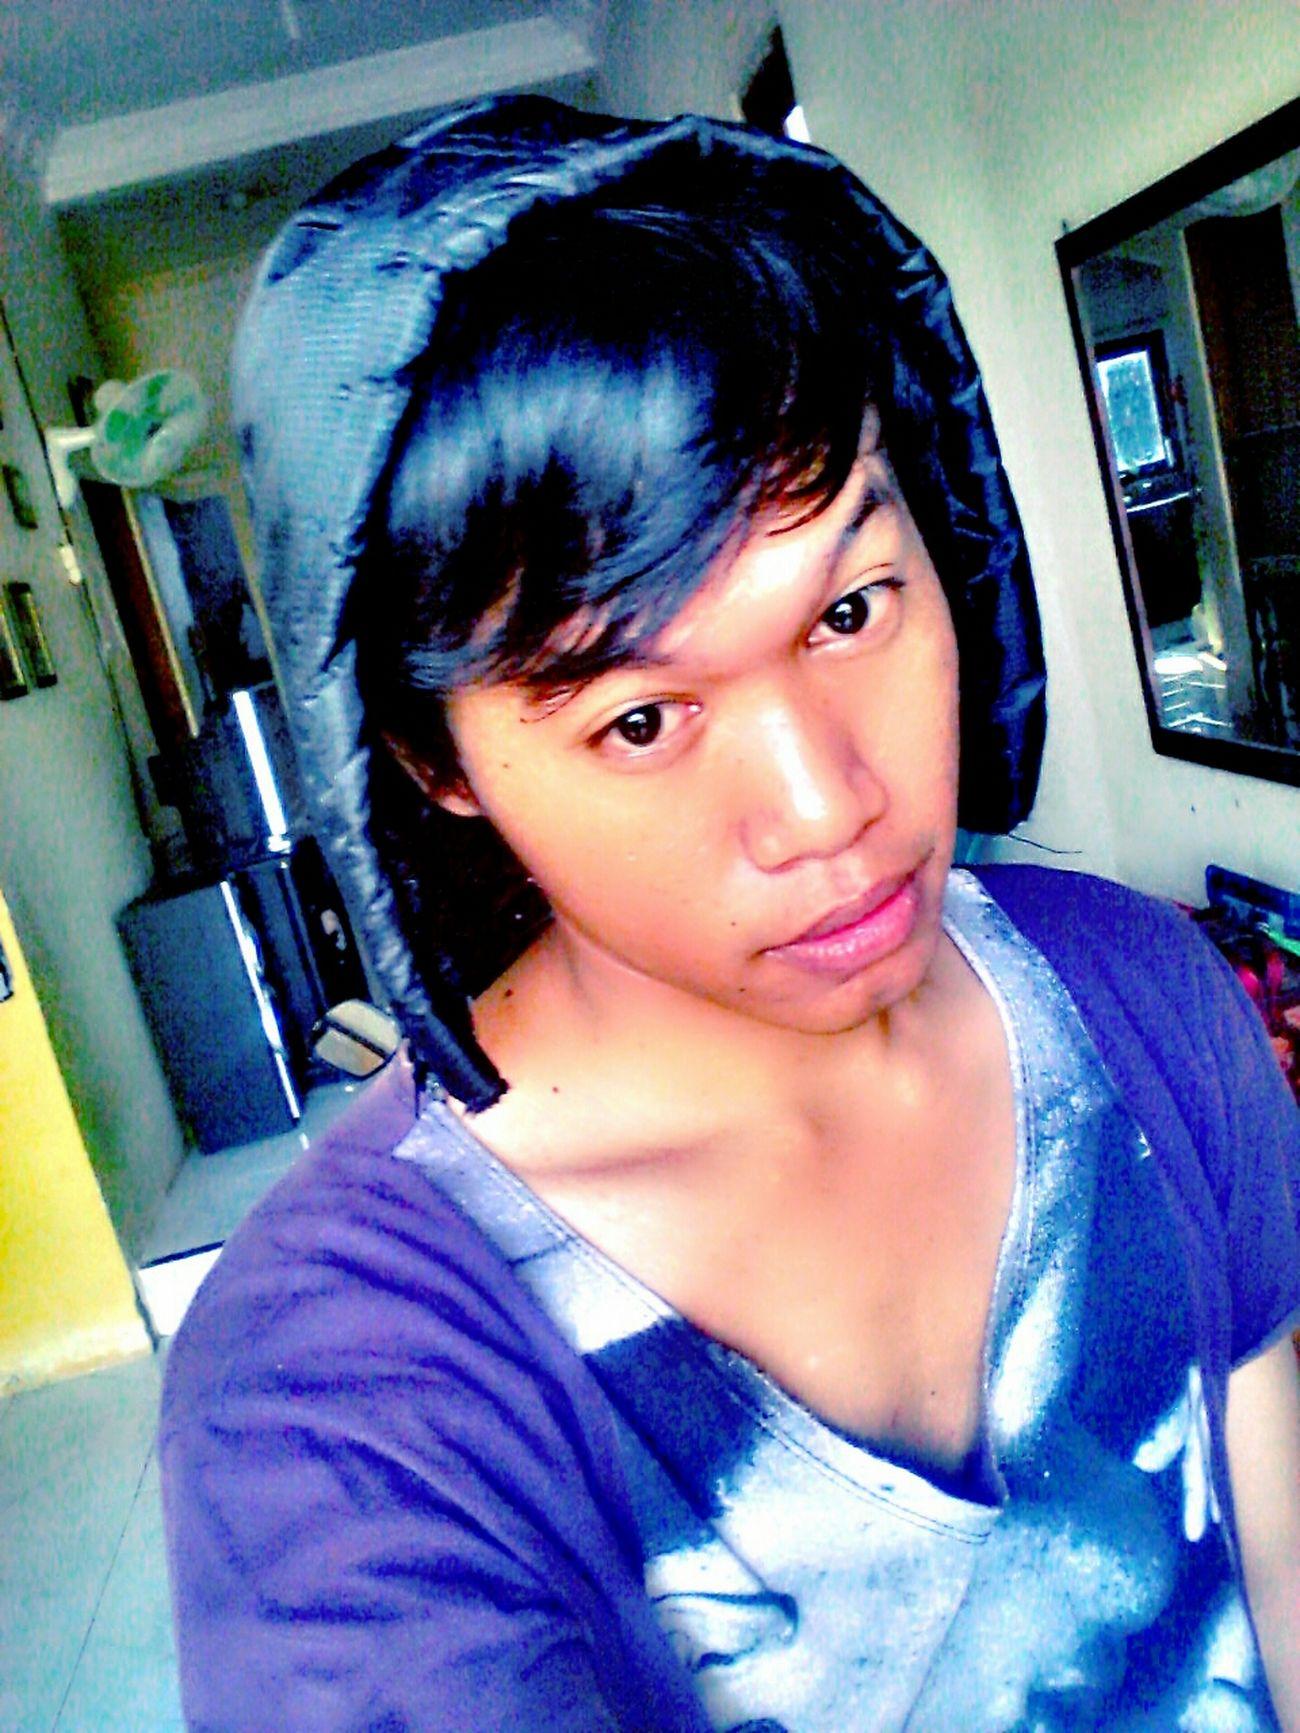 Likeforlike #likemyphoto #qlikemyphotos #like4like #likemypic #likeback #ilikeback #10likes #50likes #100likes #20likes #likere No Smiles Taking Photos EyeEm Indonesia